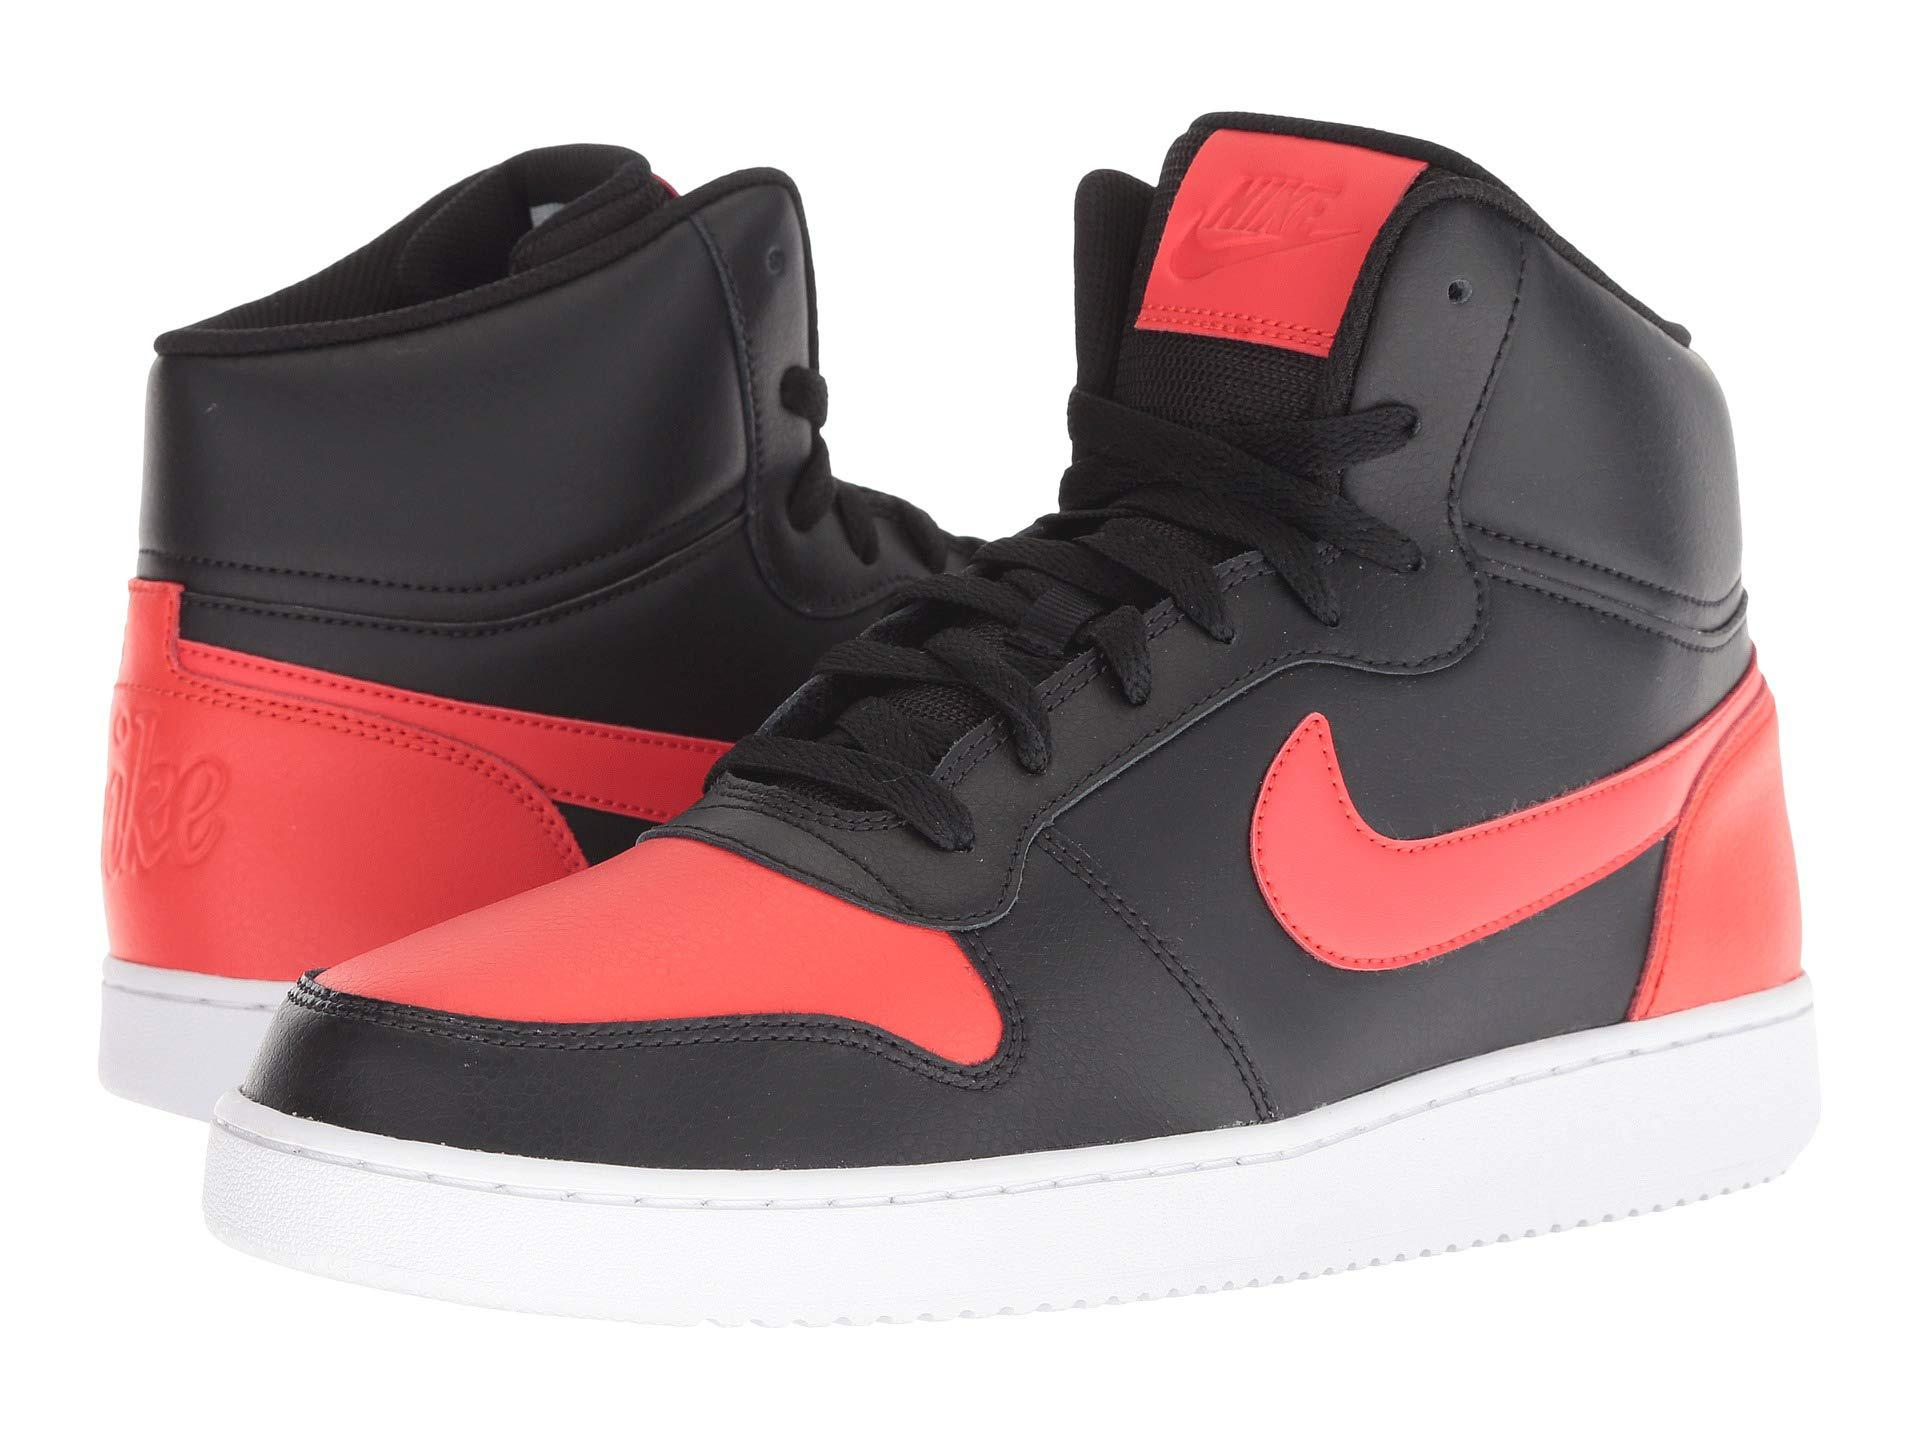 06c409d89c Lyst - Nike Ebernon Mid (black white) Men s Classic Shoes for Men